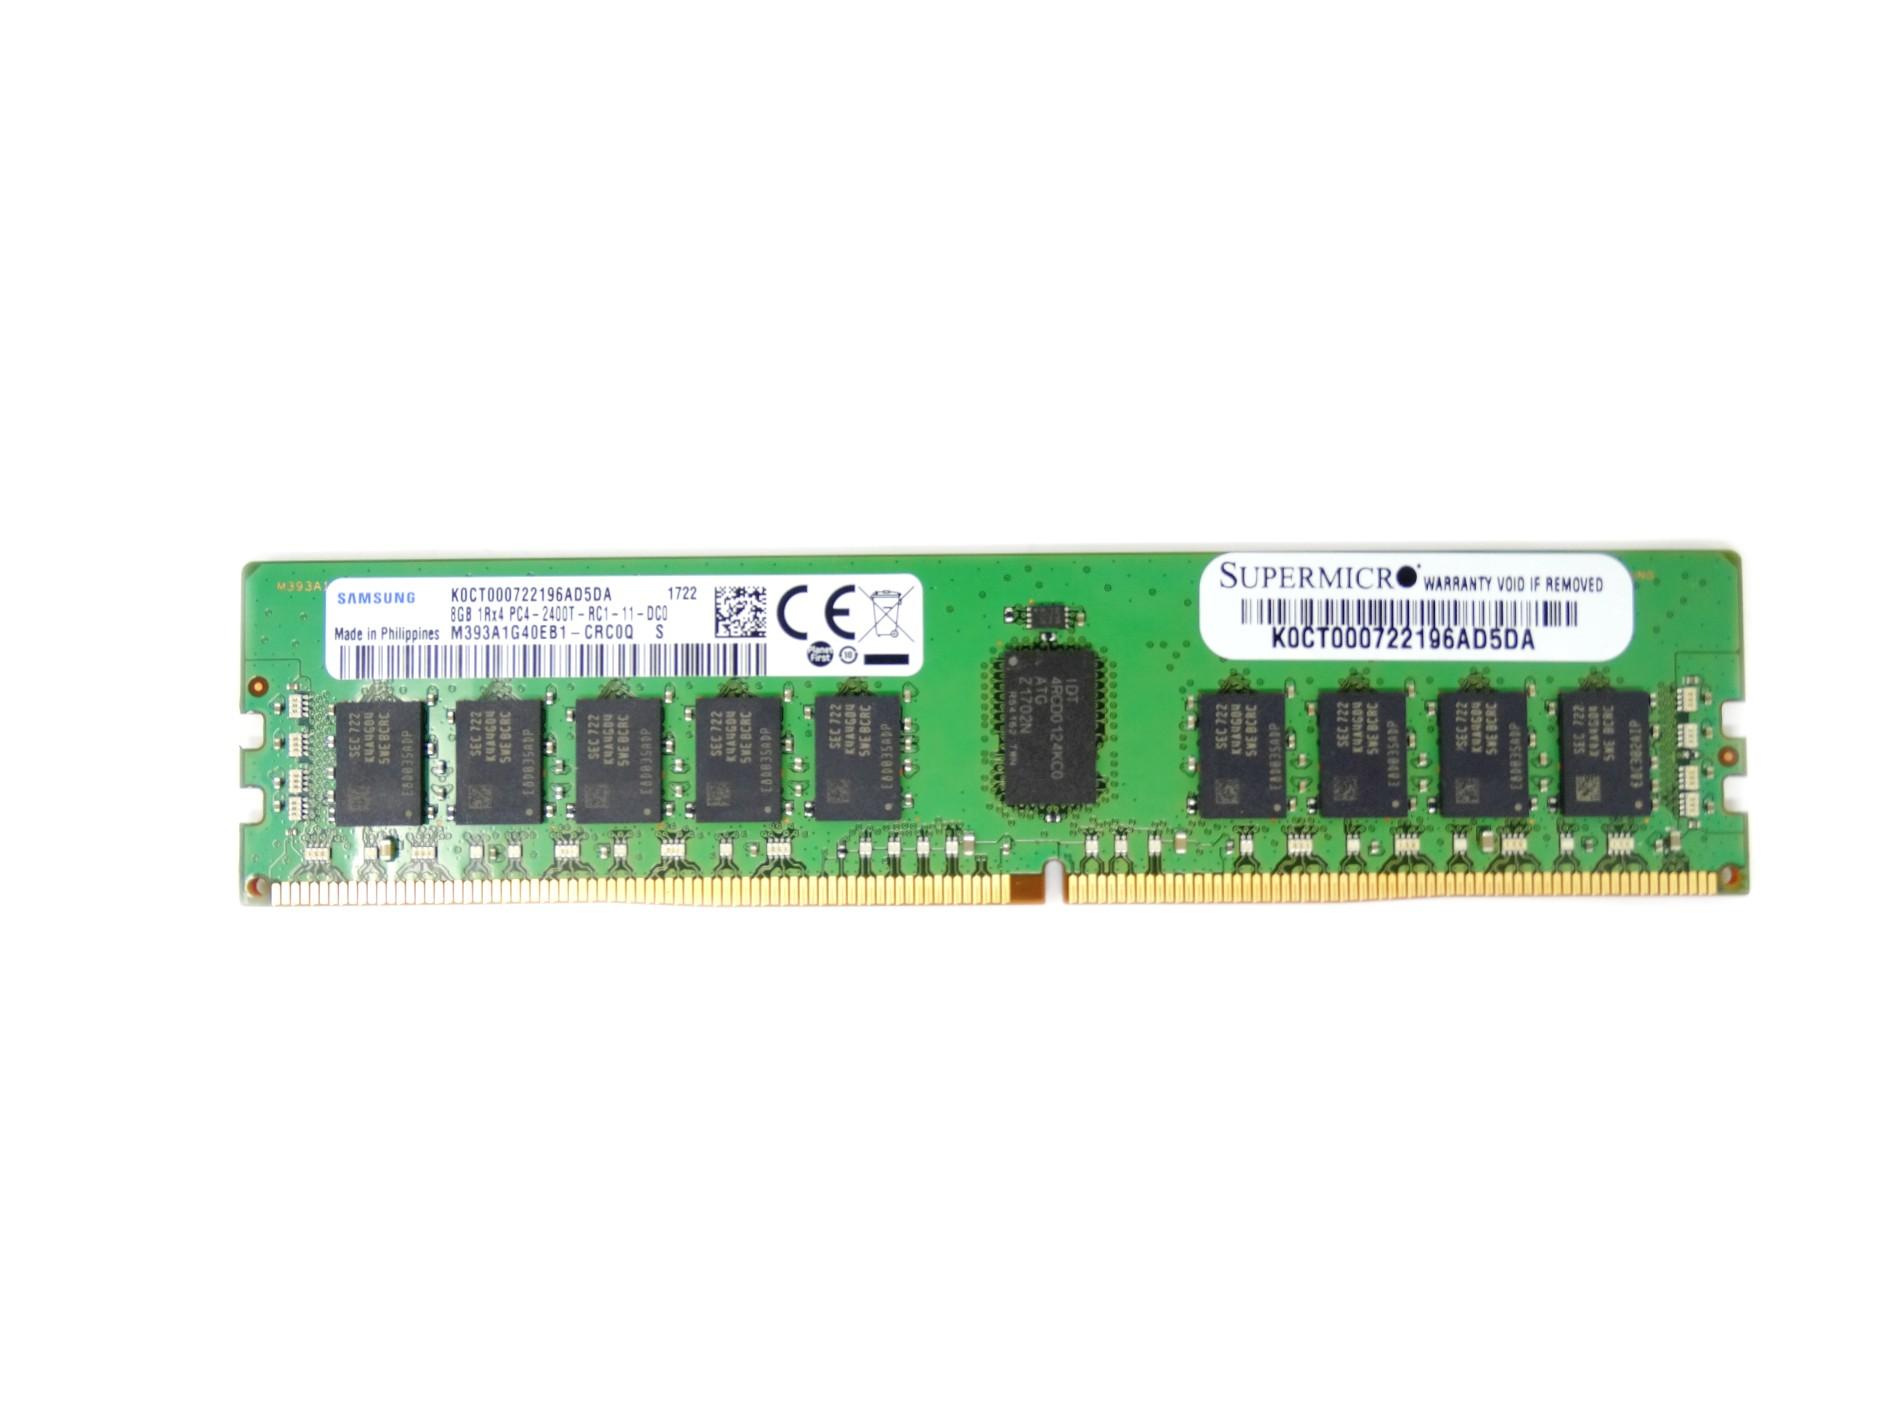 Samsung 8GB 1Rx4 PC4-2400T DDR4 2400MHz ECC Registered RAM Memory (M393A1G40EB1-CRC0Q)